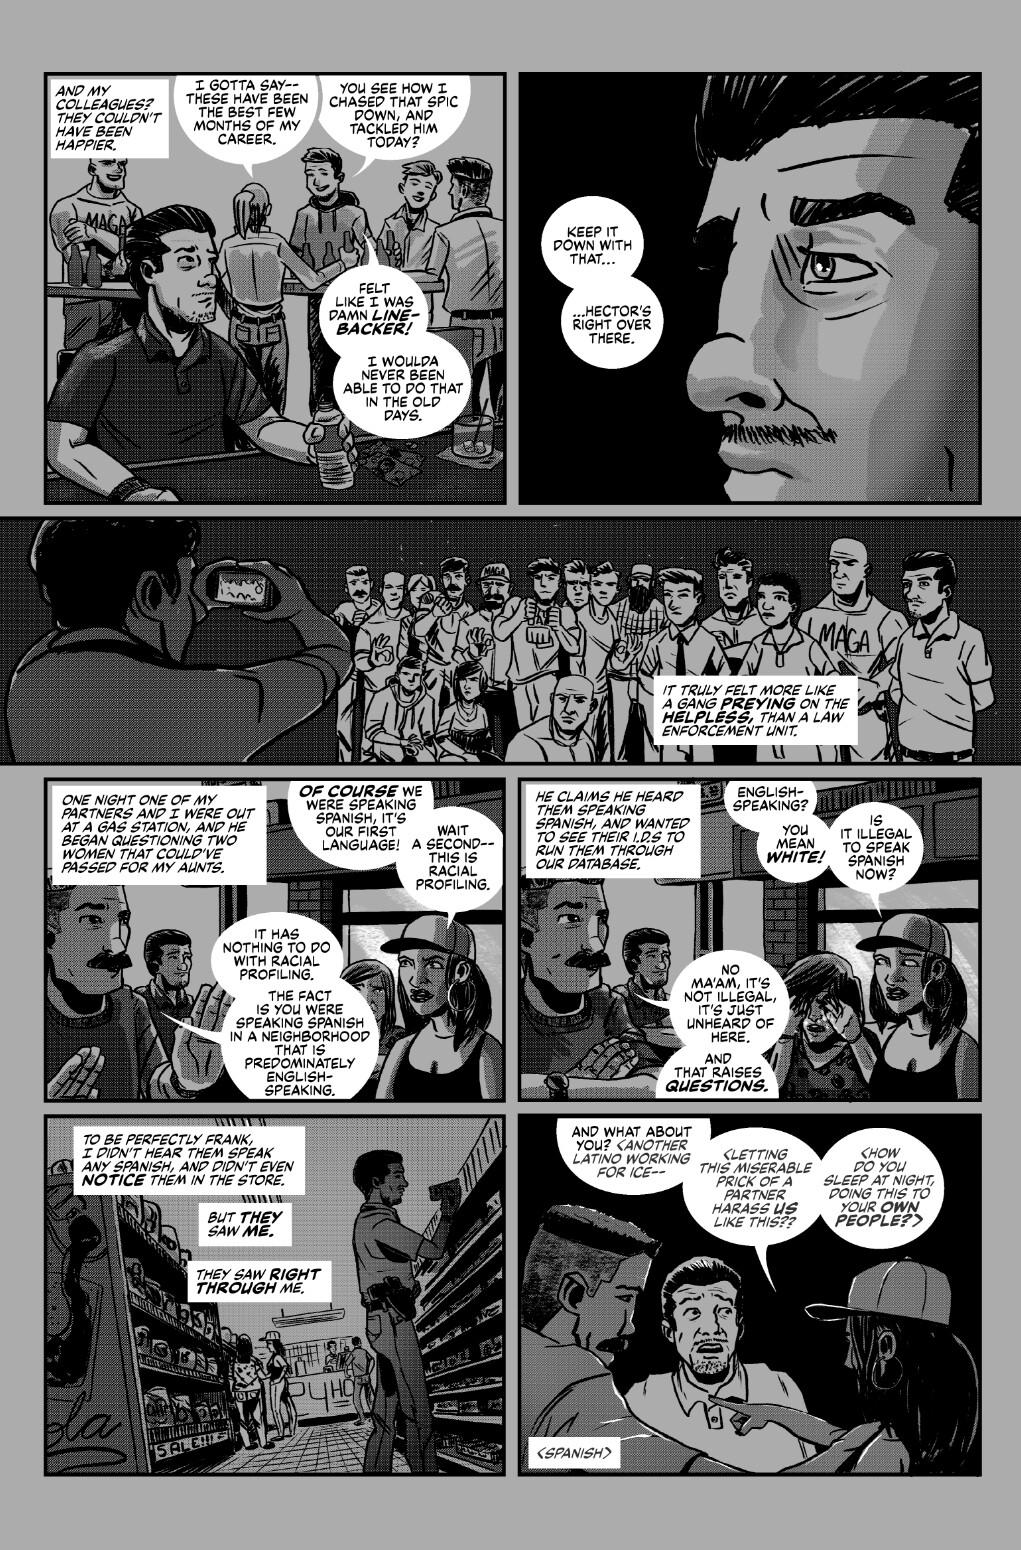 Sincerely, Agent Mejía: Page 5